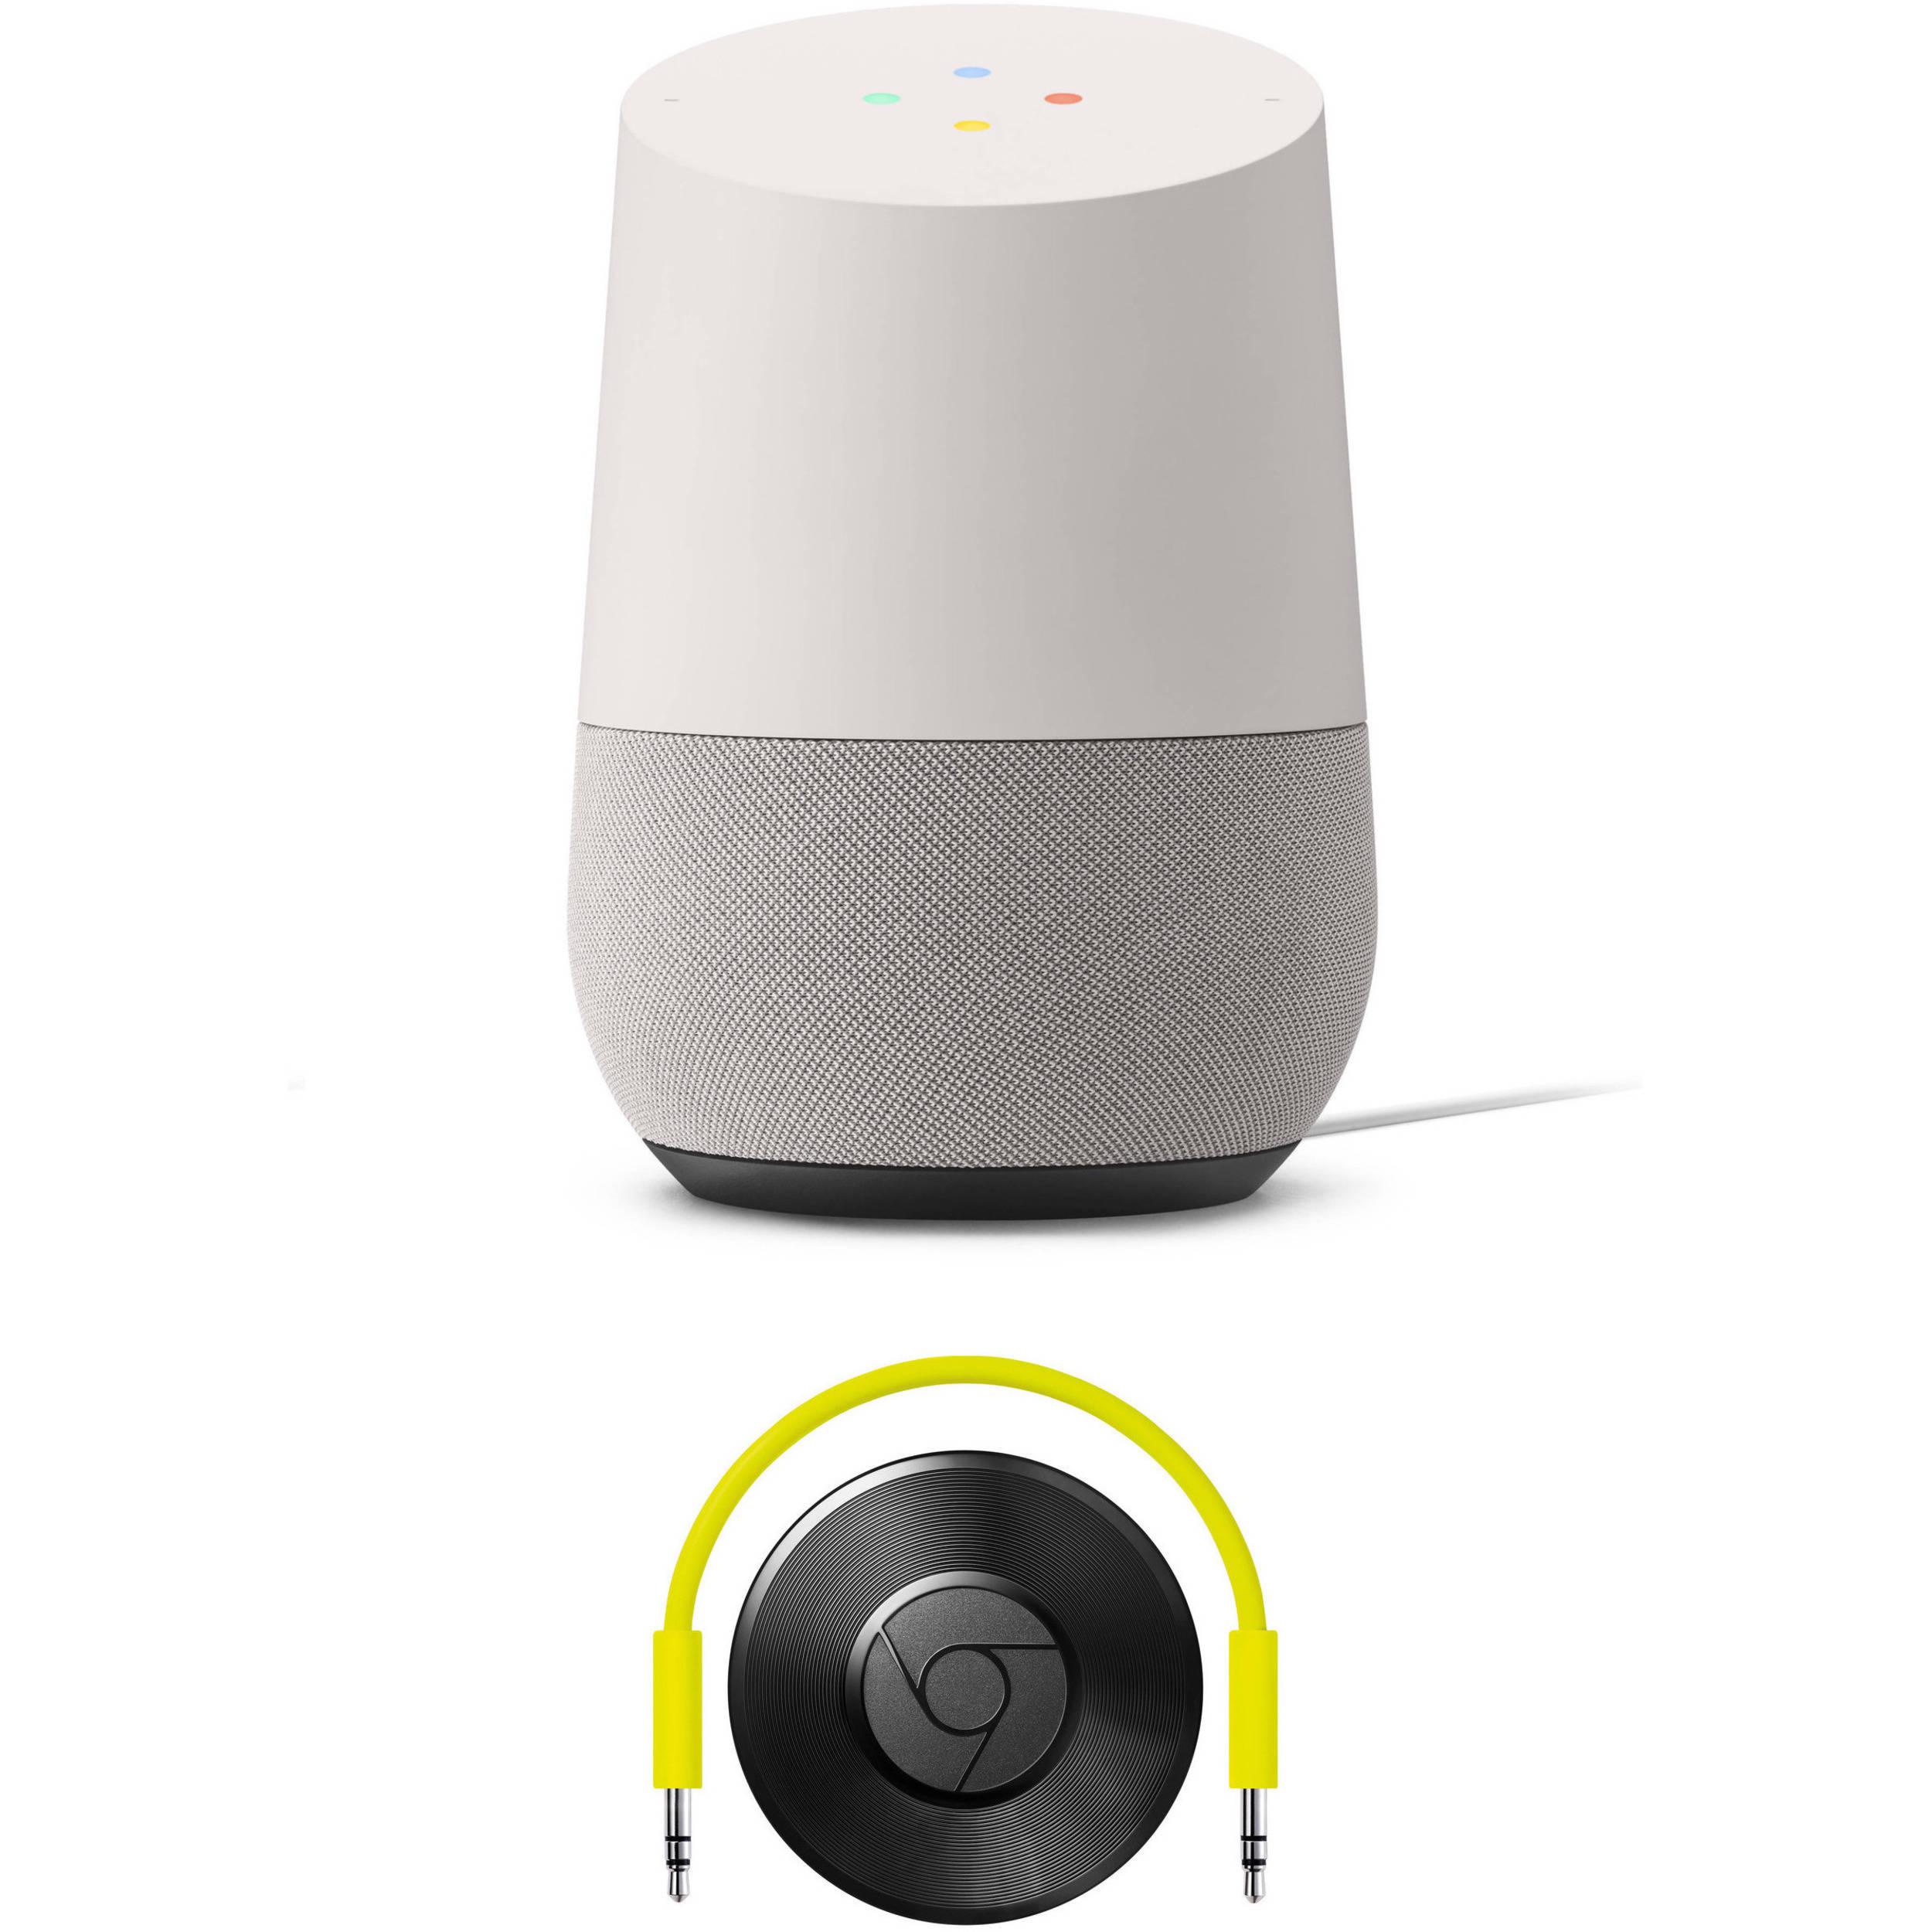 Https C Product 1318630 Reg Speaker Portable Pa Addons Bob Audio 12 Inch 3 Mic Wireless Digital Google Home And Chromecast 1387747